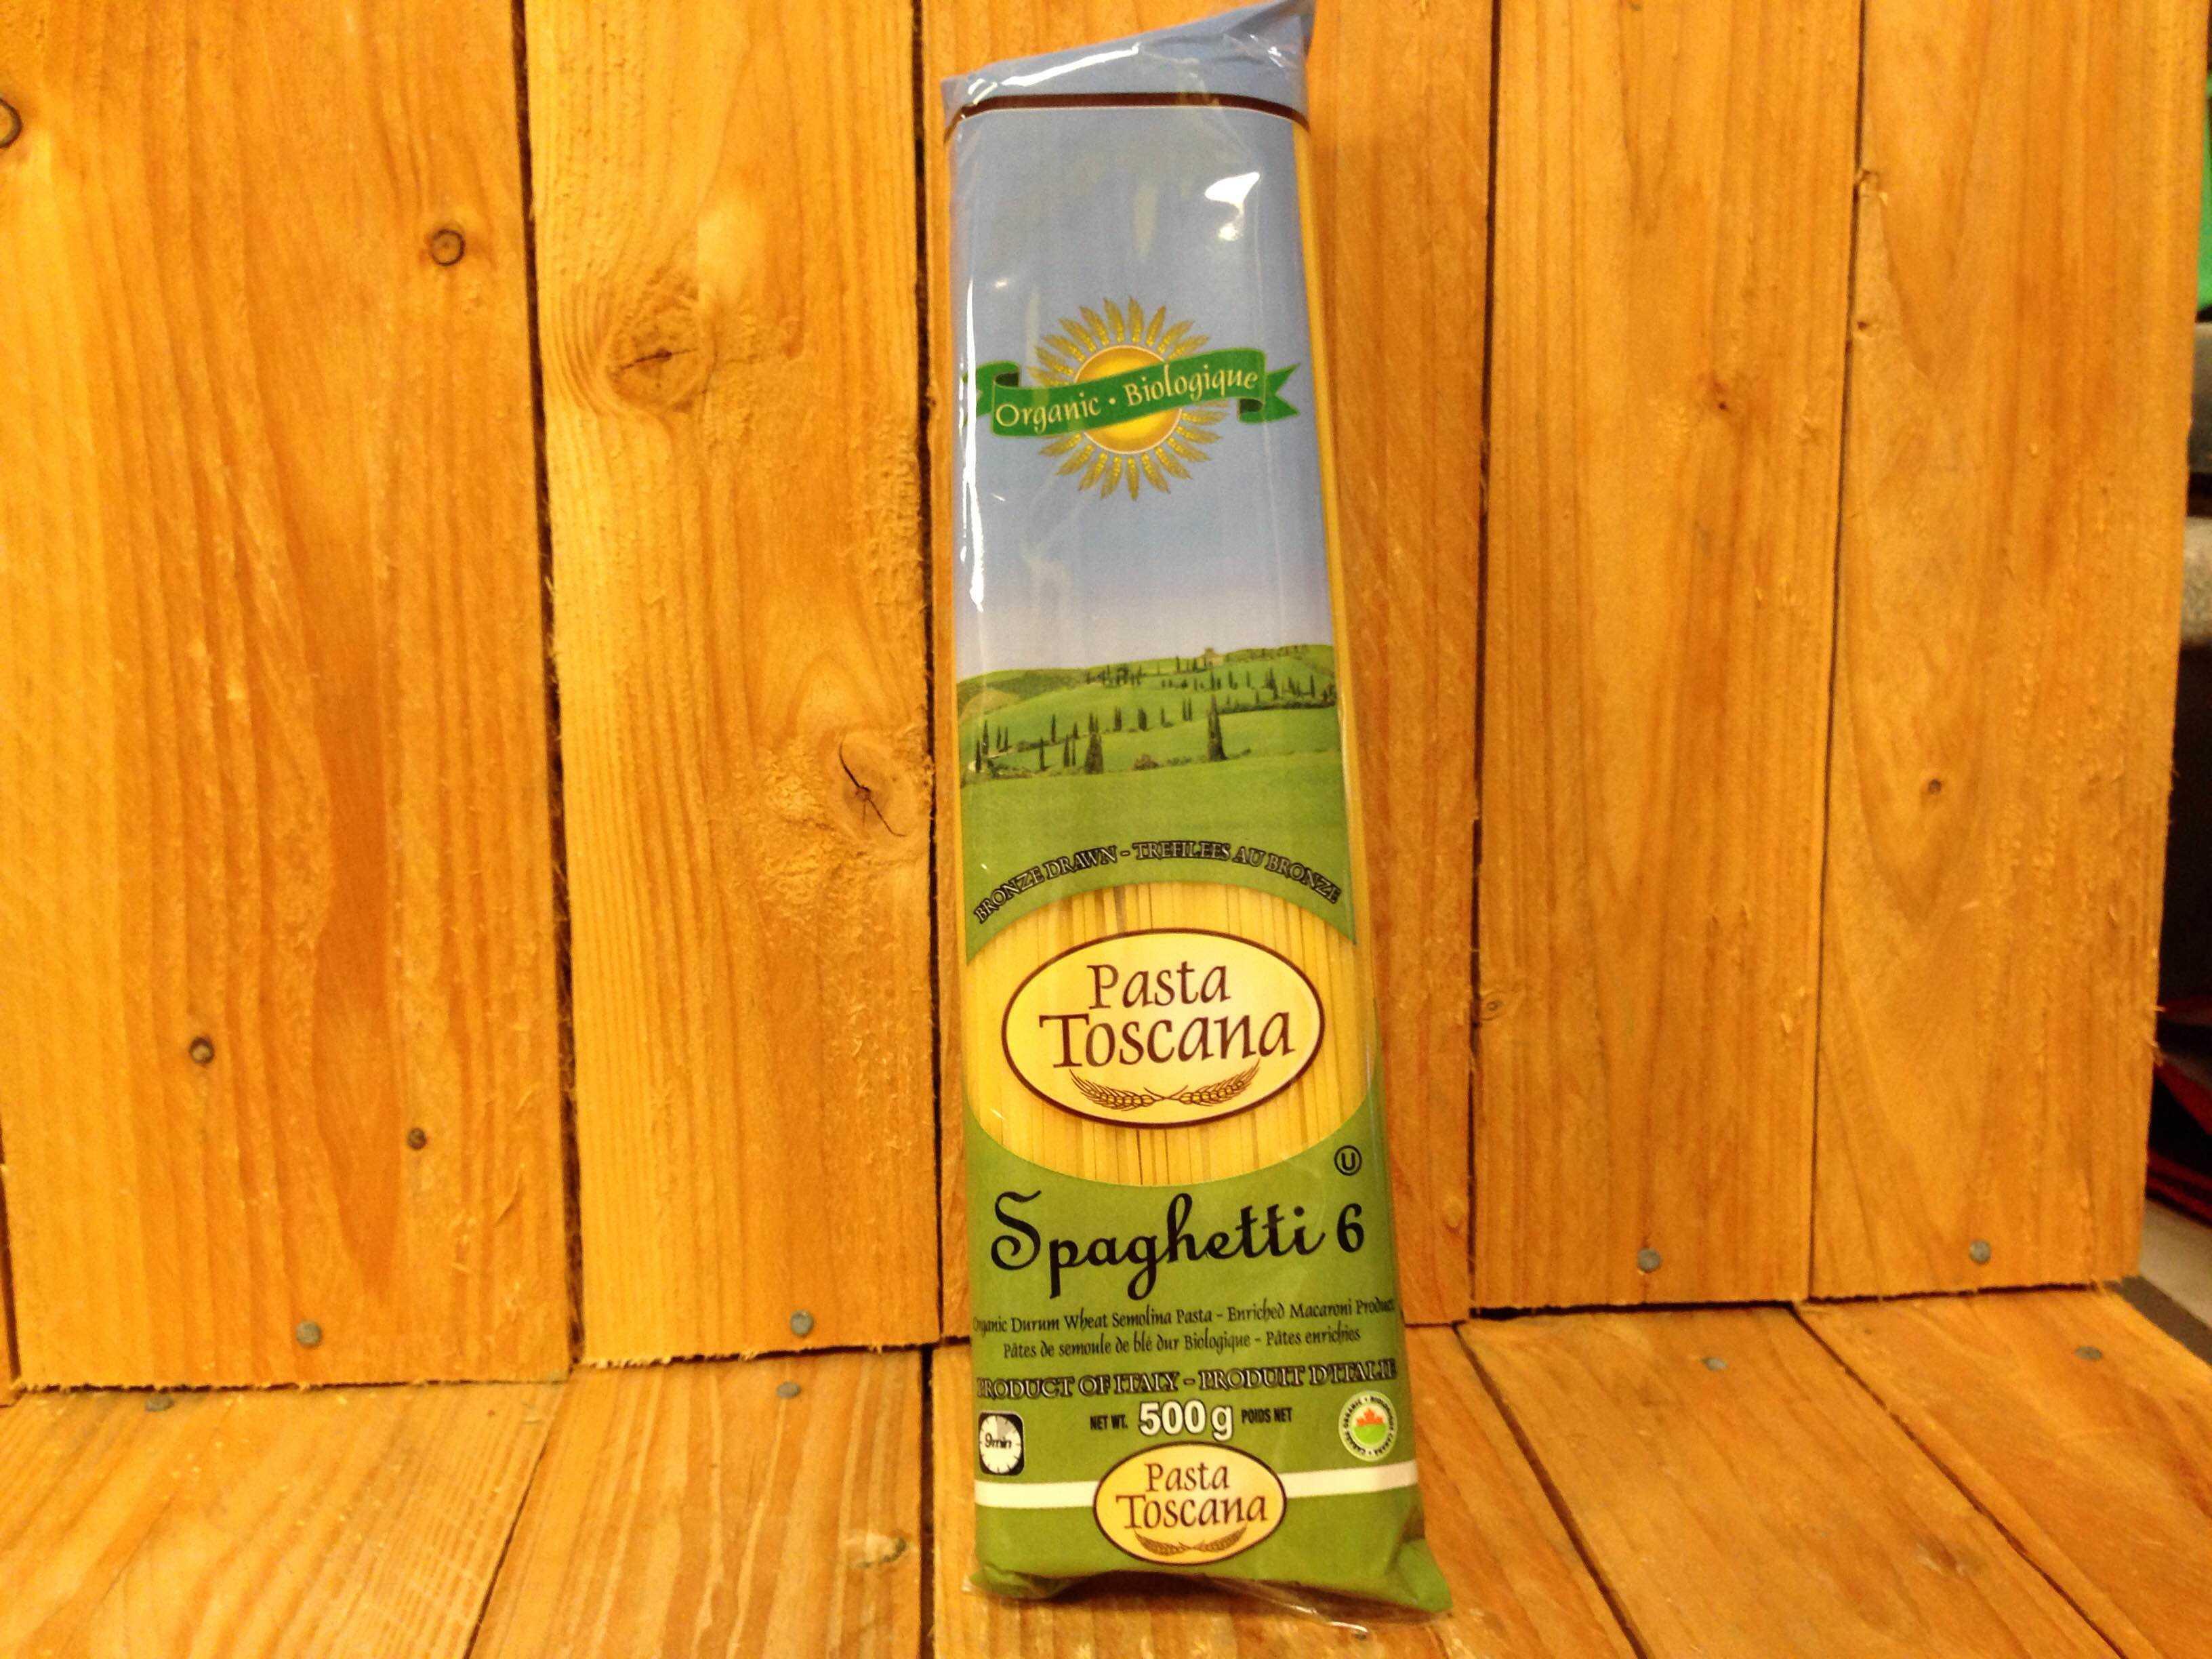 Pasta Toscana – Organic Spaghetti – Durum Wheat (500g Bag)